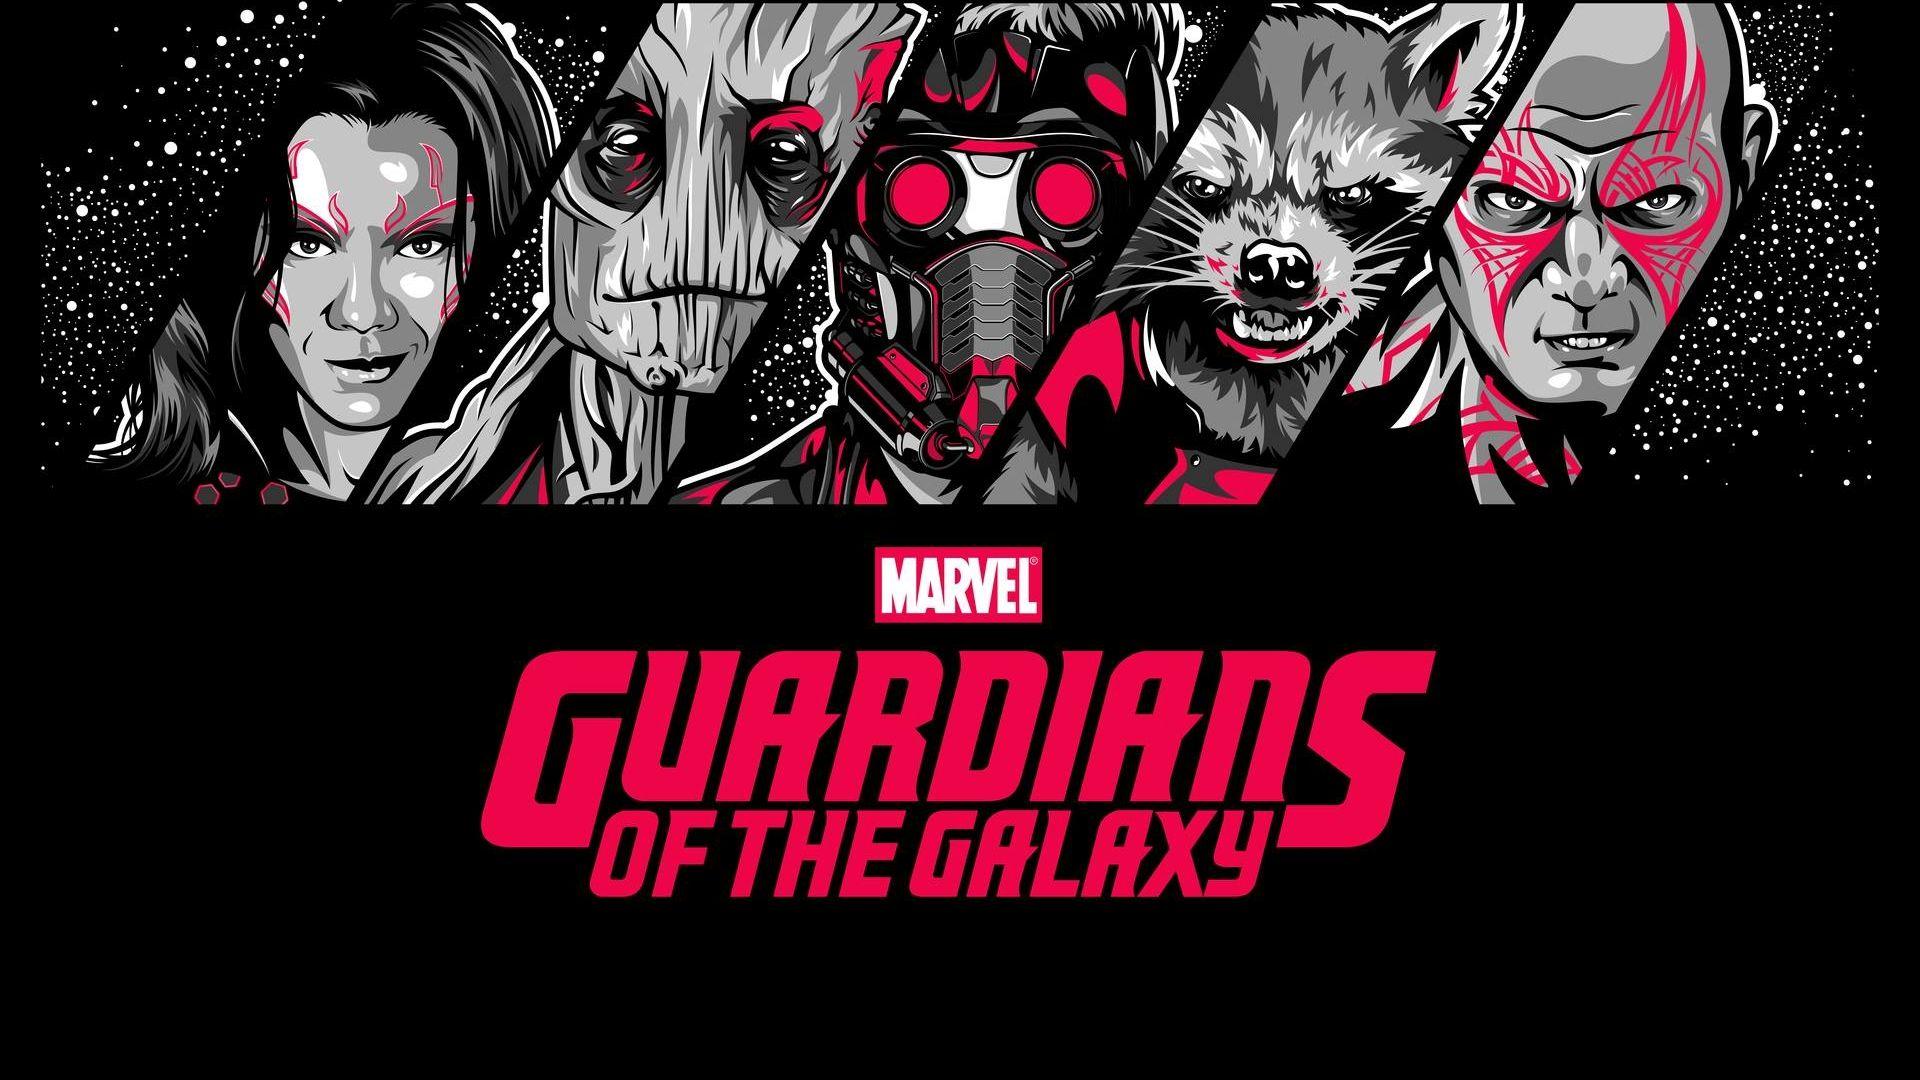 Guardians Of The Galaxy Galaxy Comics Guardians Of The Galaxy Marvel Wallpaper